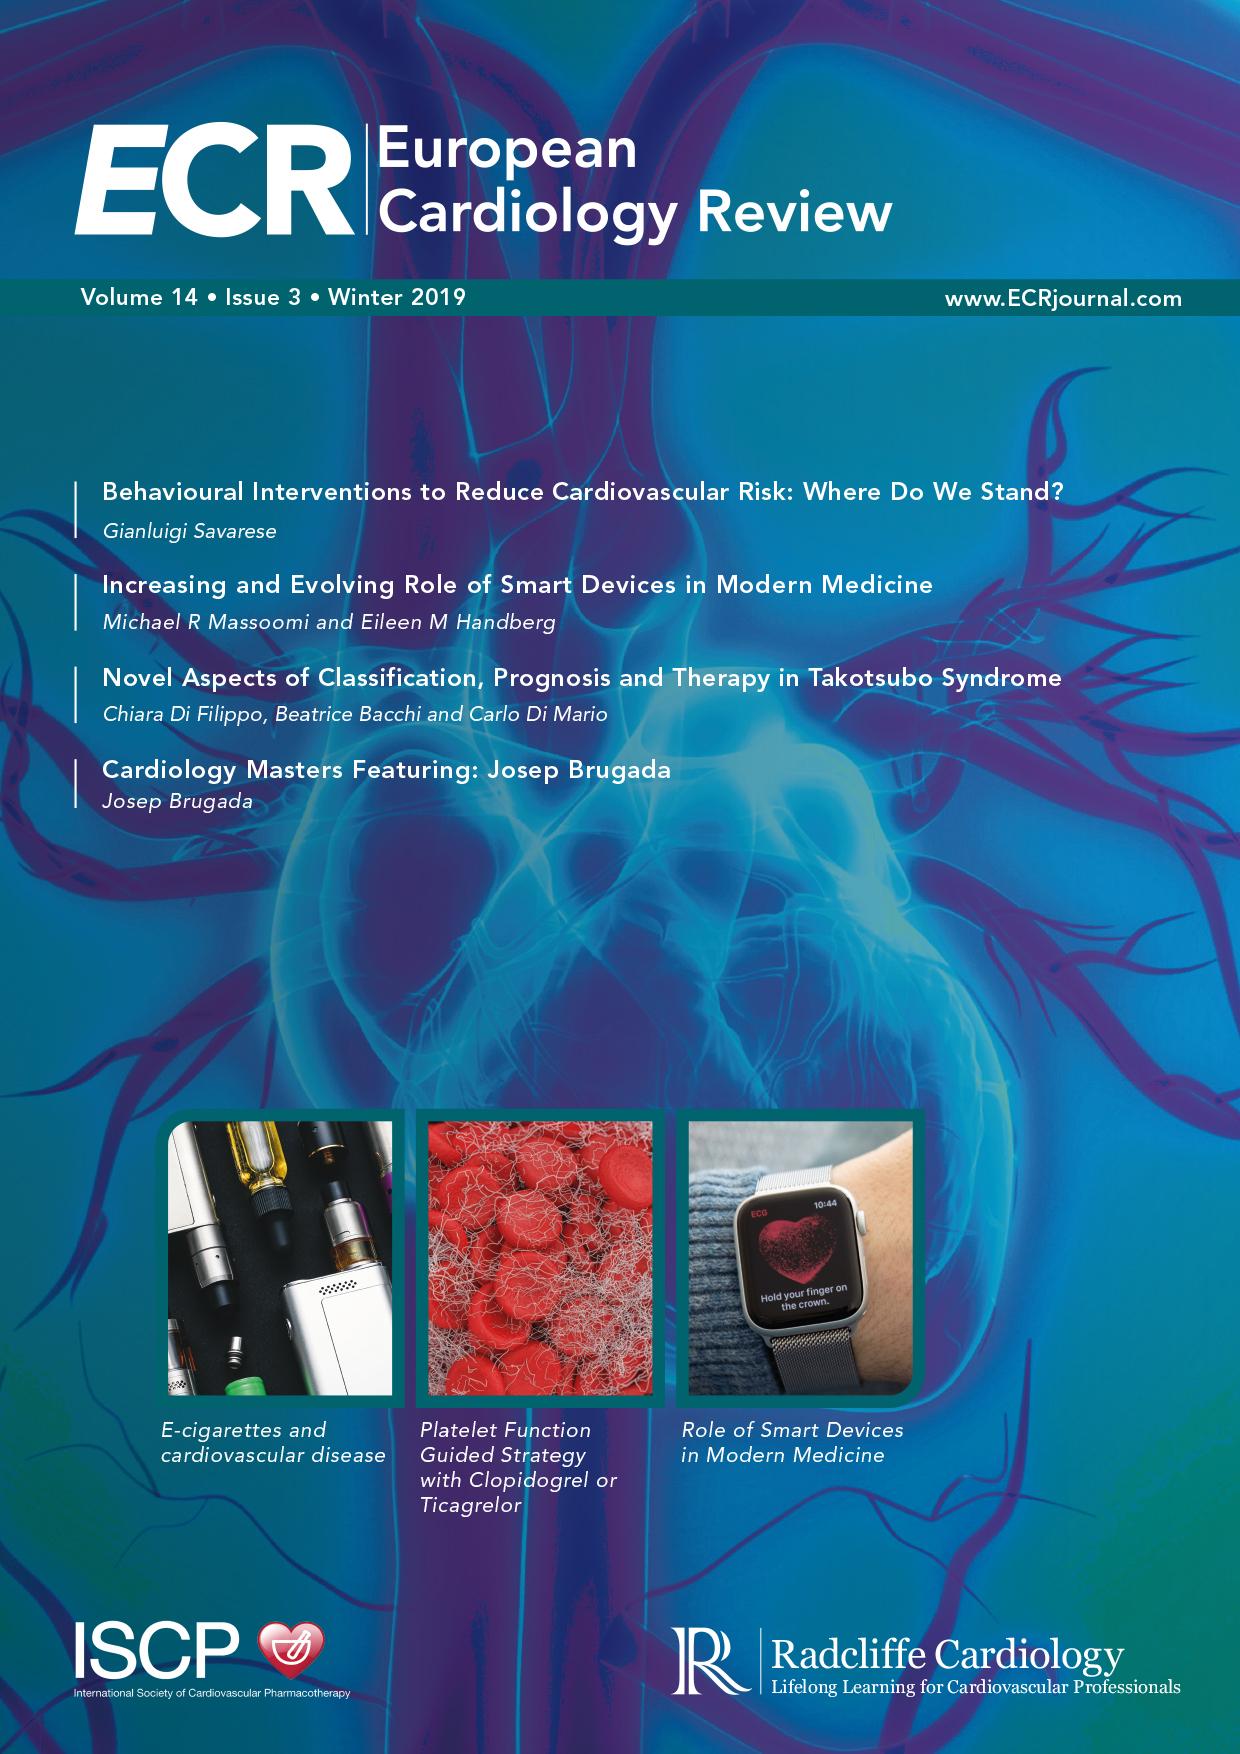 ECR - Volume 14 Issue 3 Winter 2019